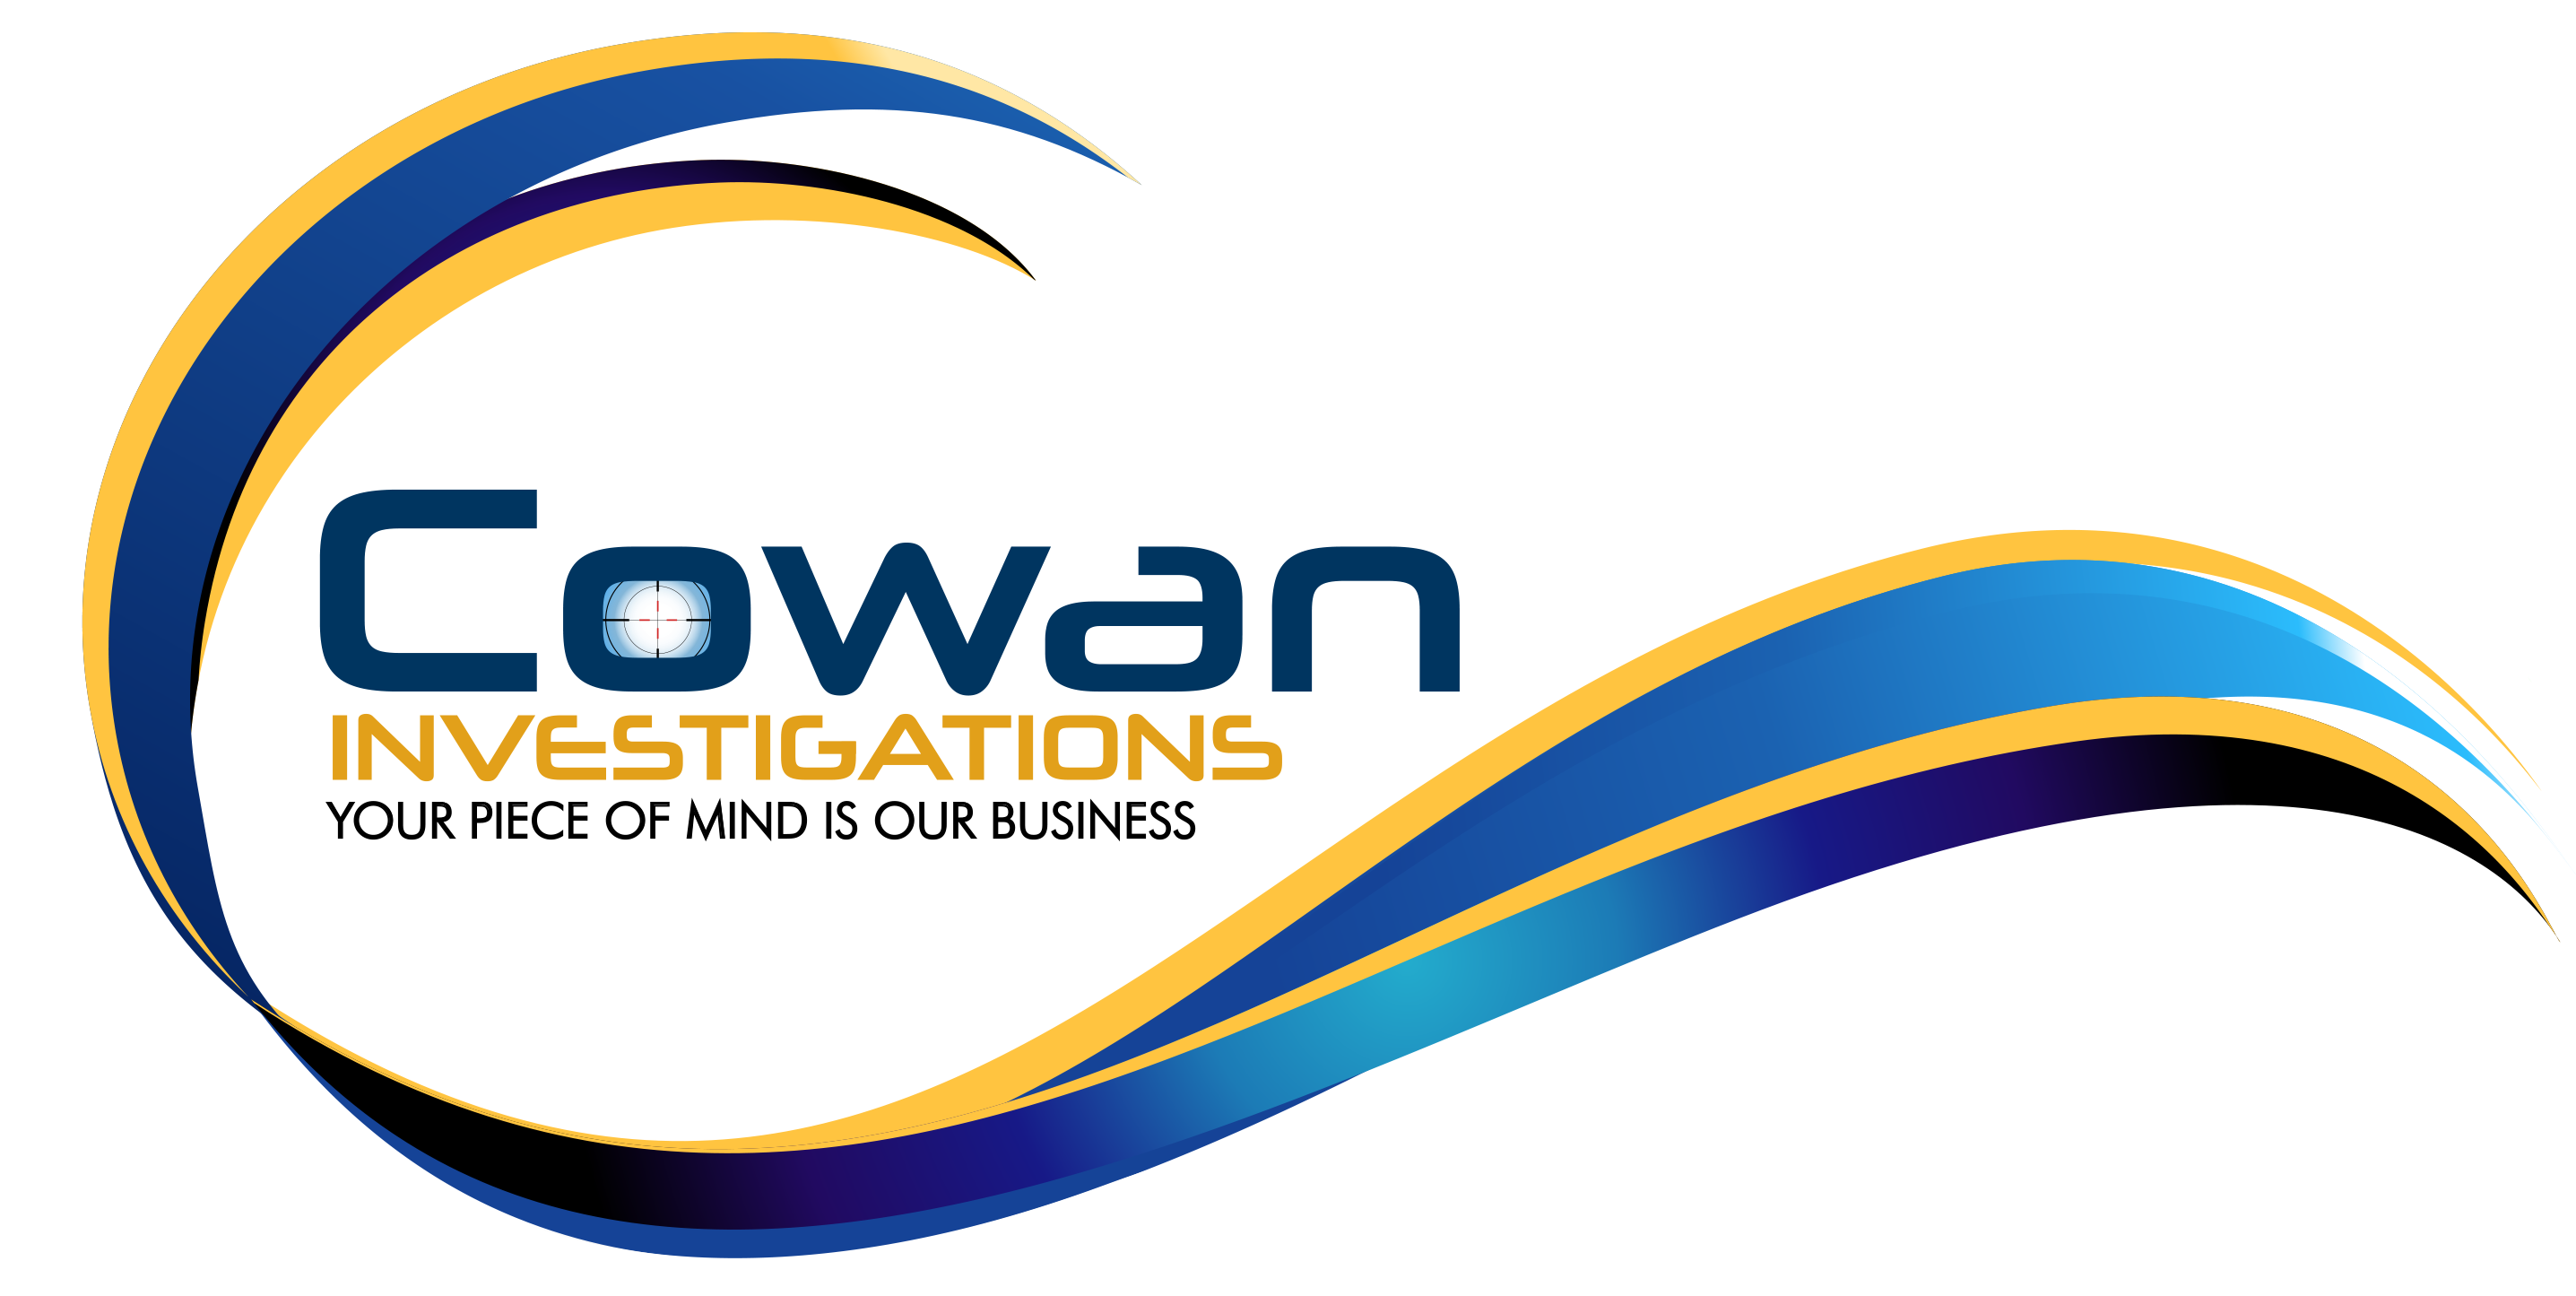 Cowan Investigations